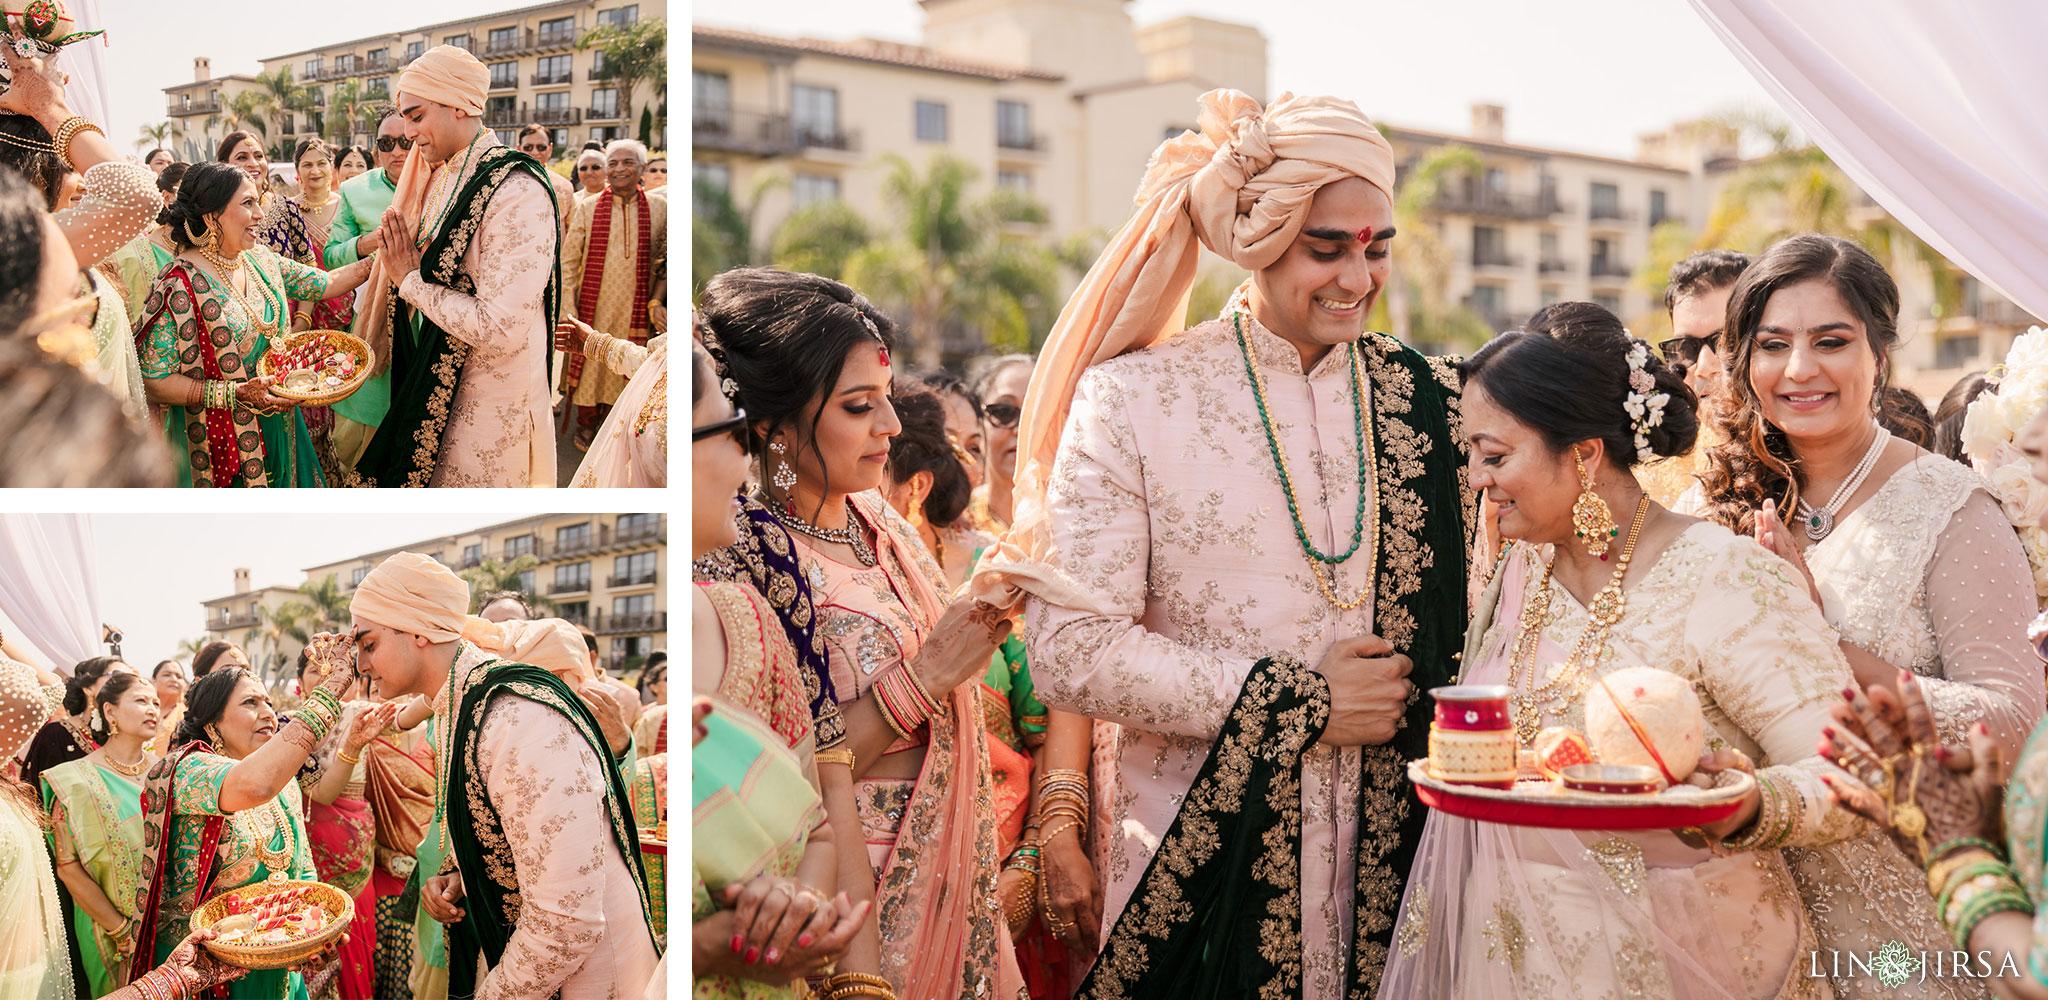 027 terranea resort palos verdes indian baraat wedding photography